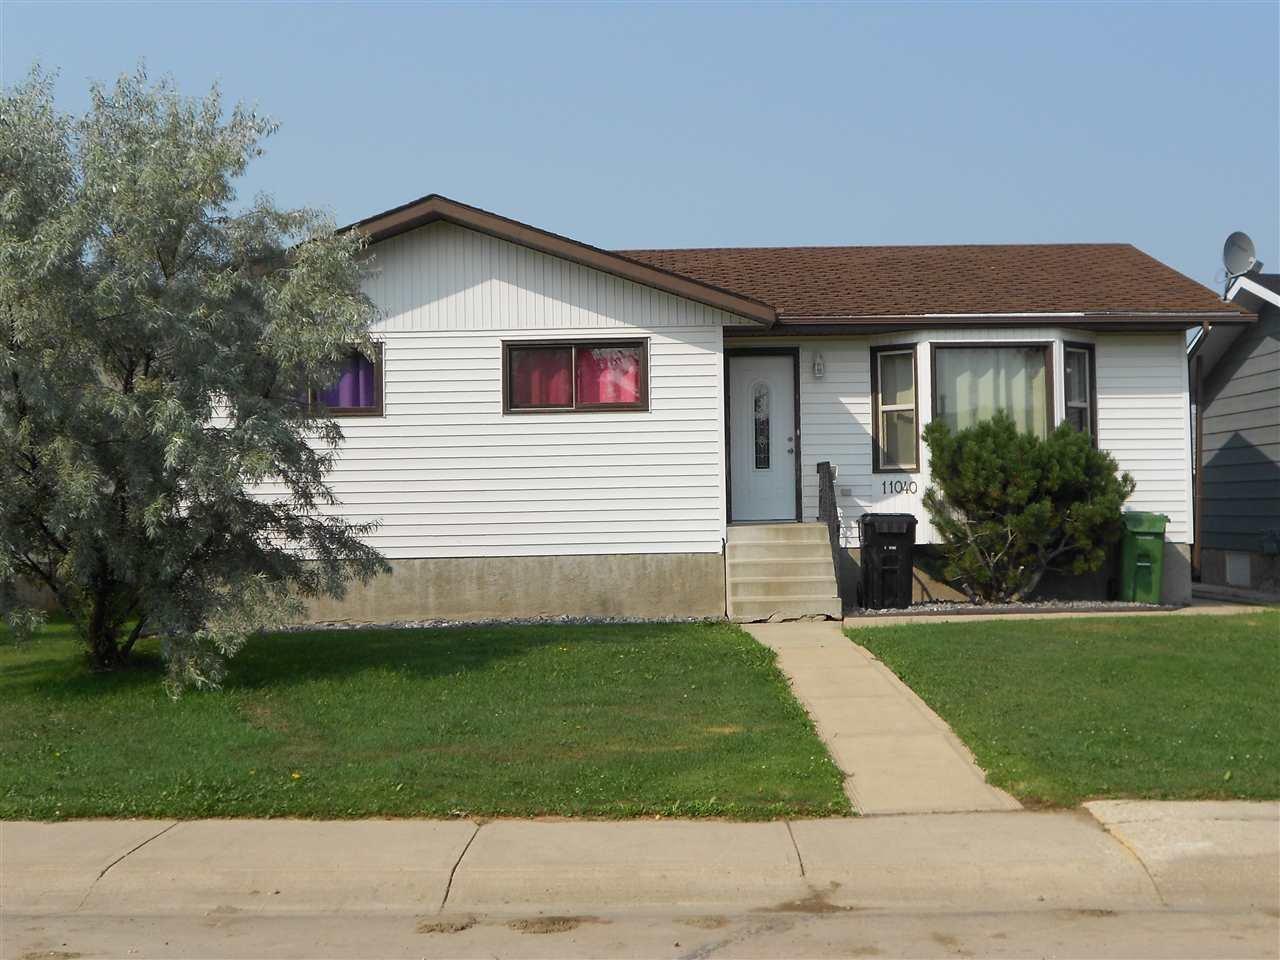 Main Photo: 11040 104 Street: Westlock House for sale : MLS®# E4212458